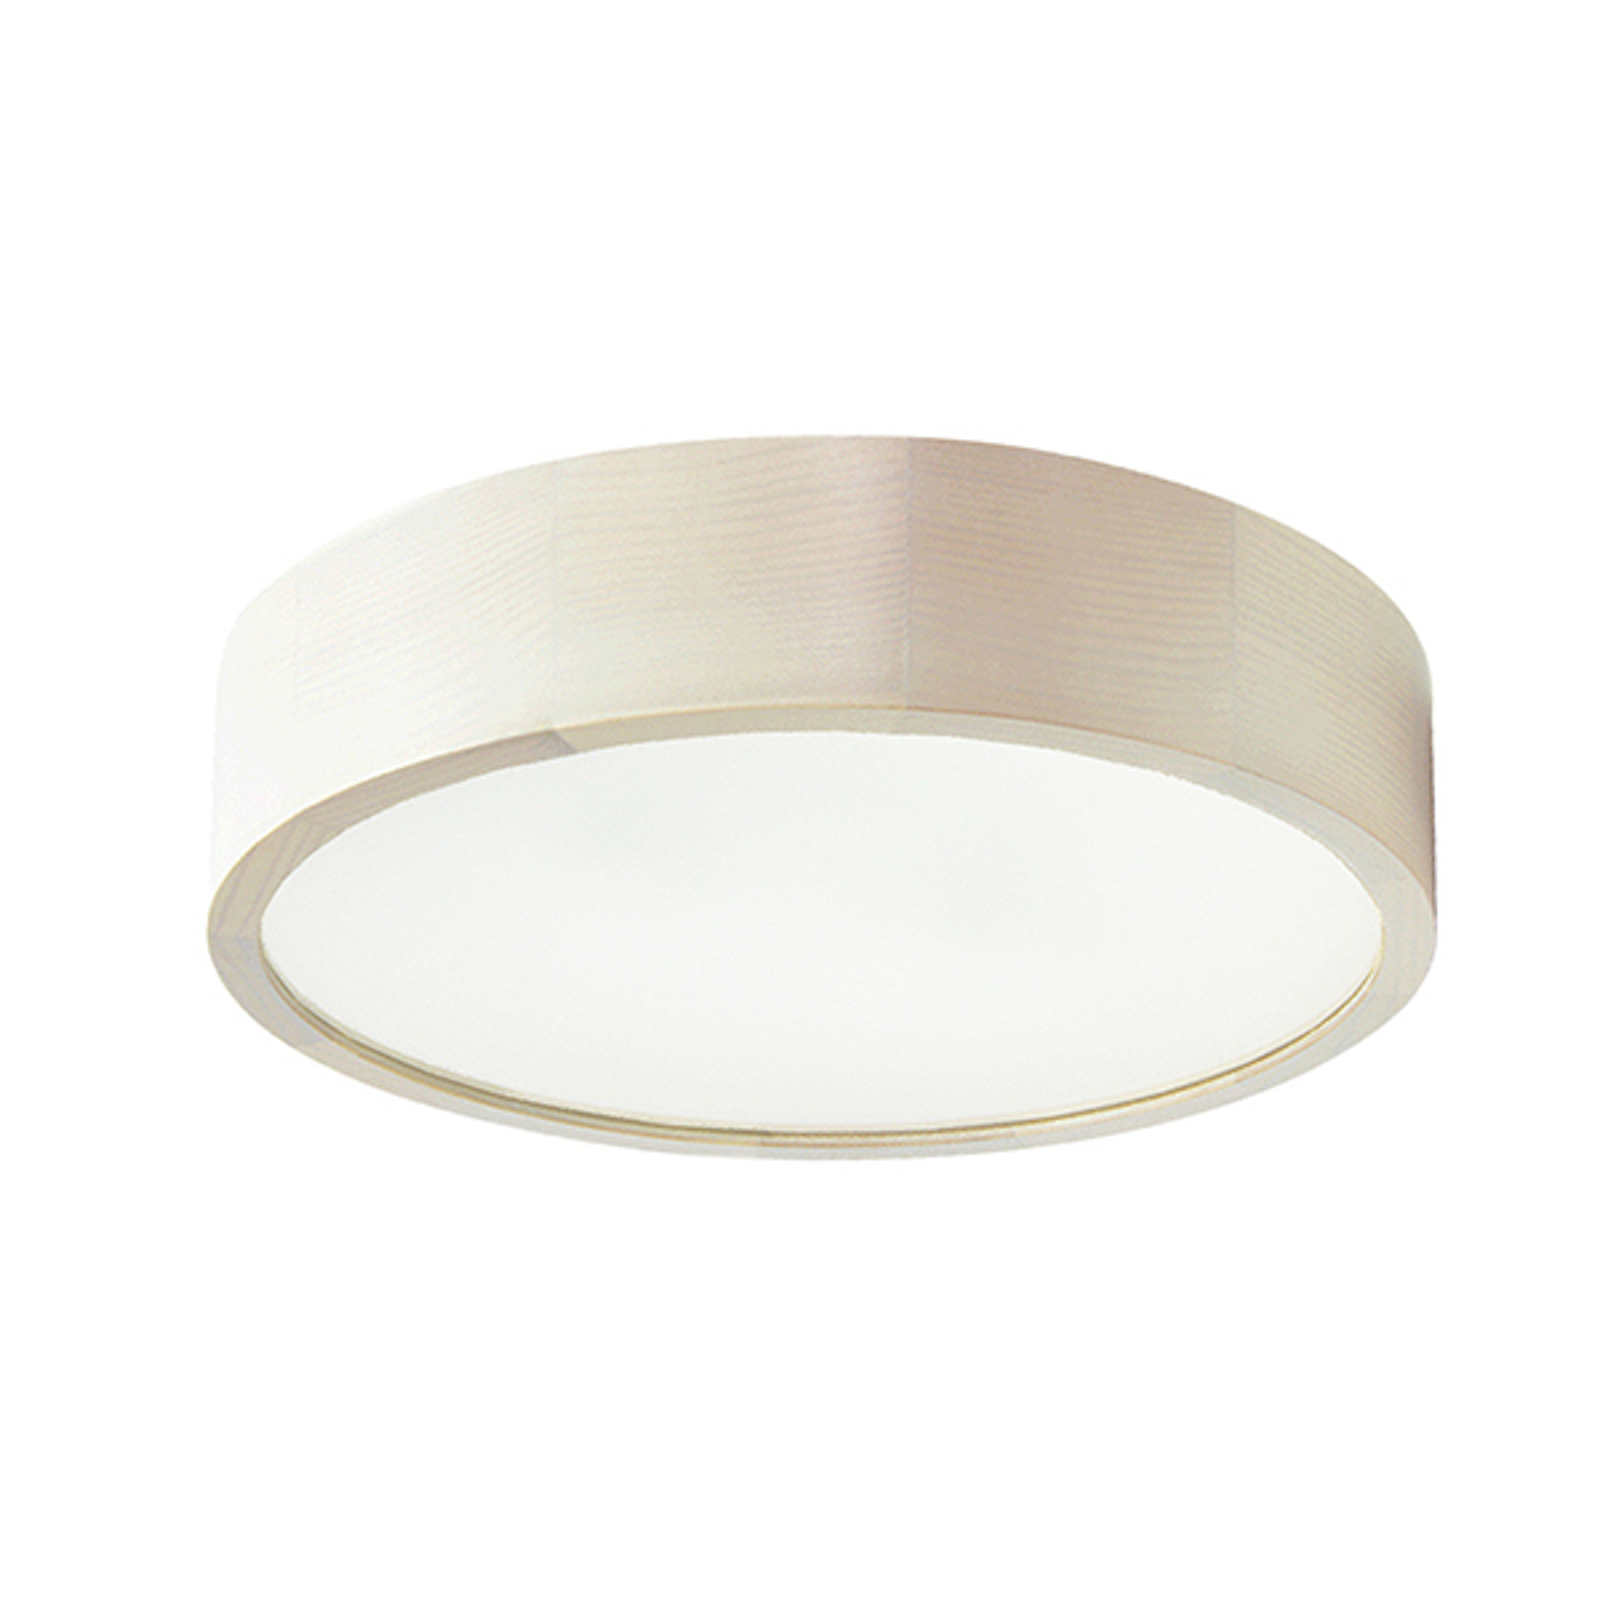 LED-taklampa Cleo, Ø 38 cm, vit